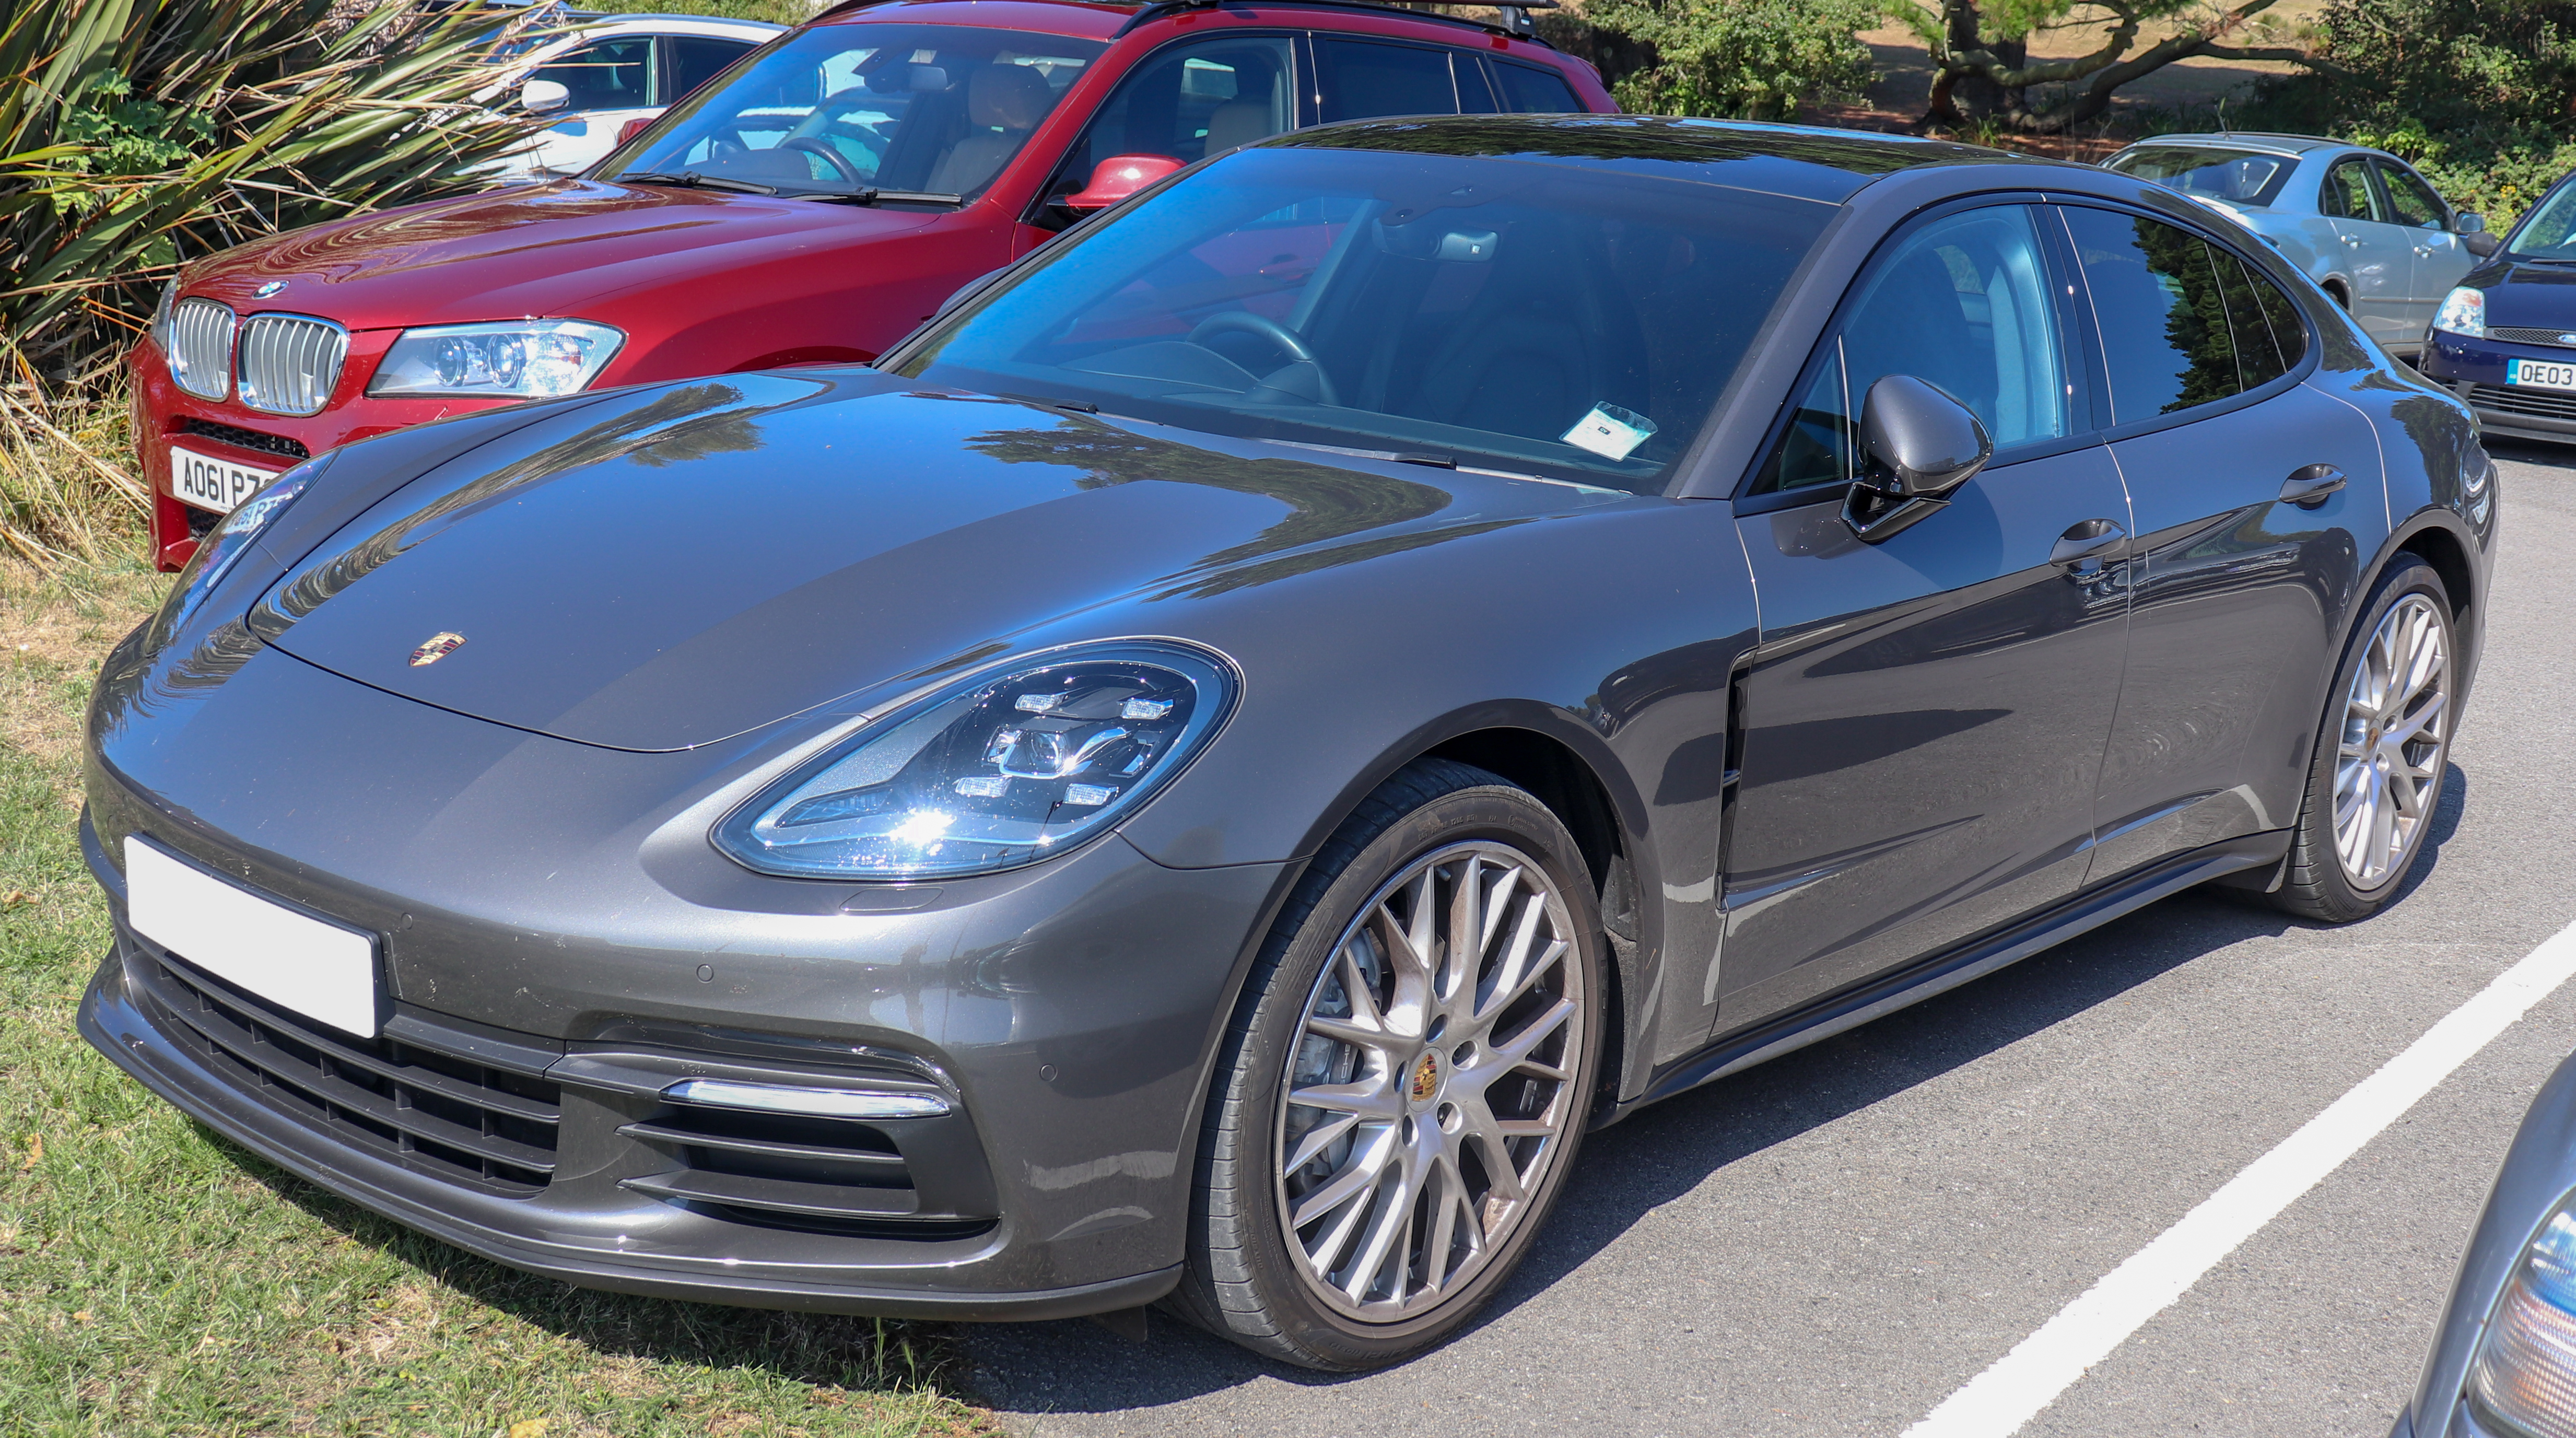 Ficheiro 2017 Porsche Panamera S A 3 0 Front Jpg Wikipedia A Enciclopedia Livre